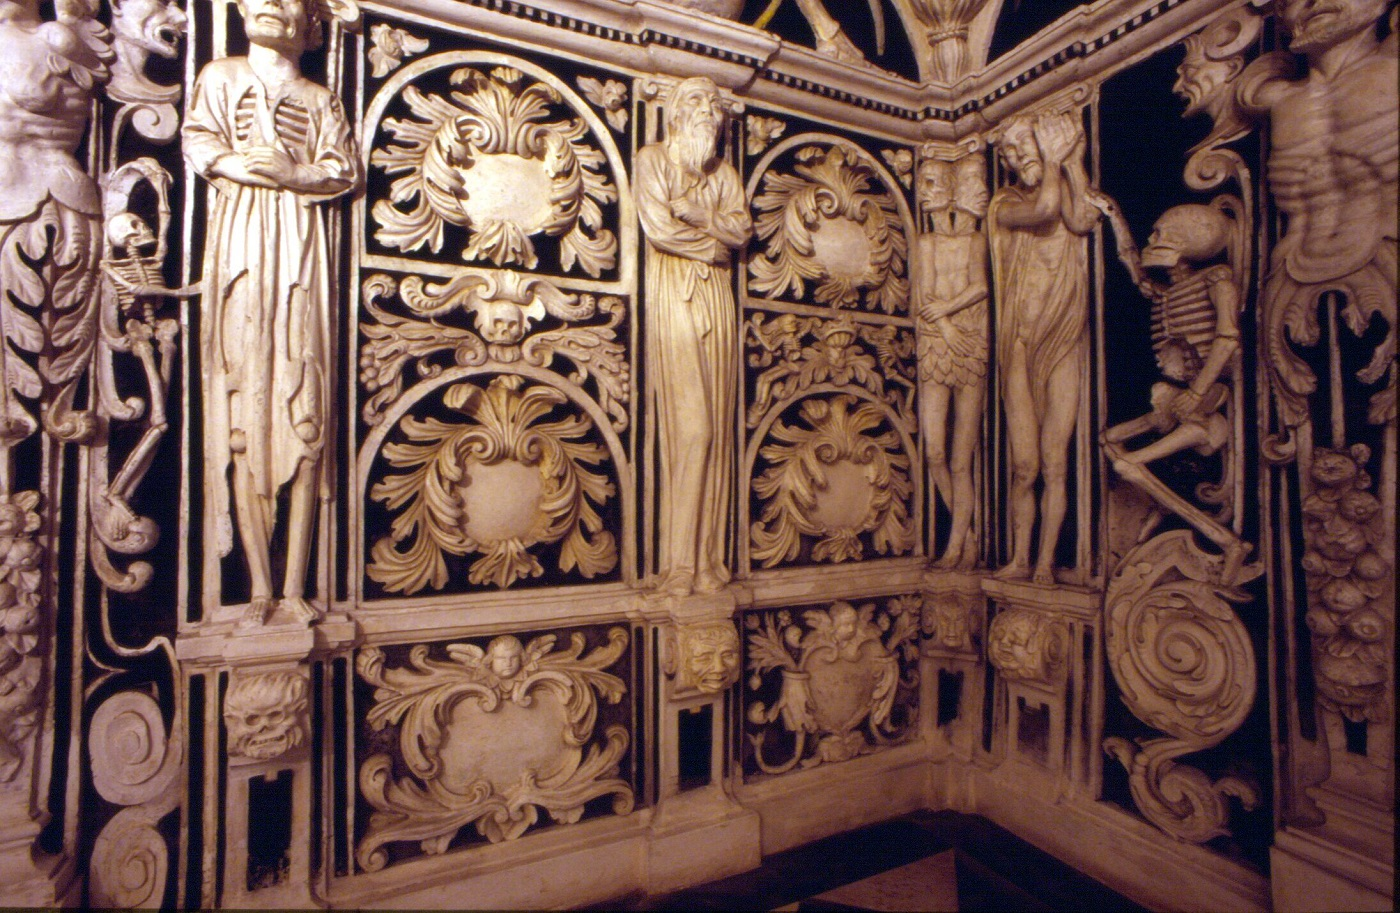 Crypt of Santa Maria - Things to Do in Malaga